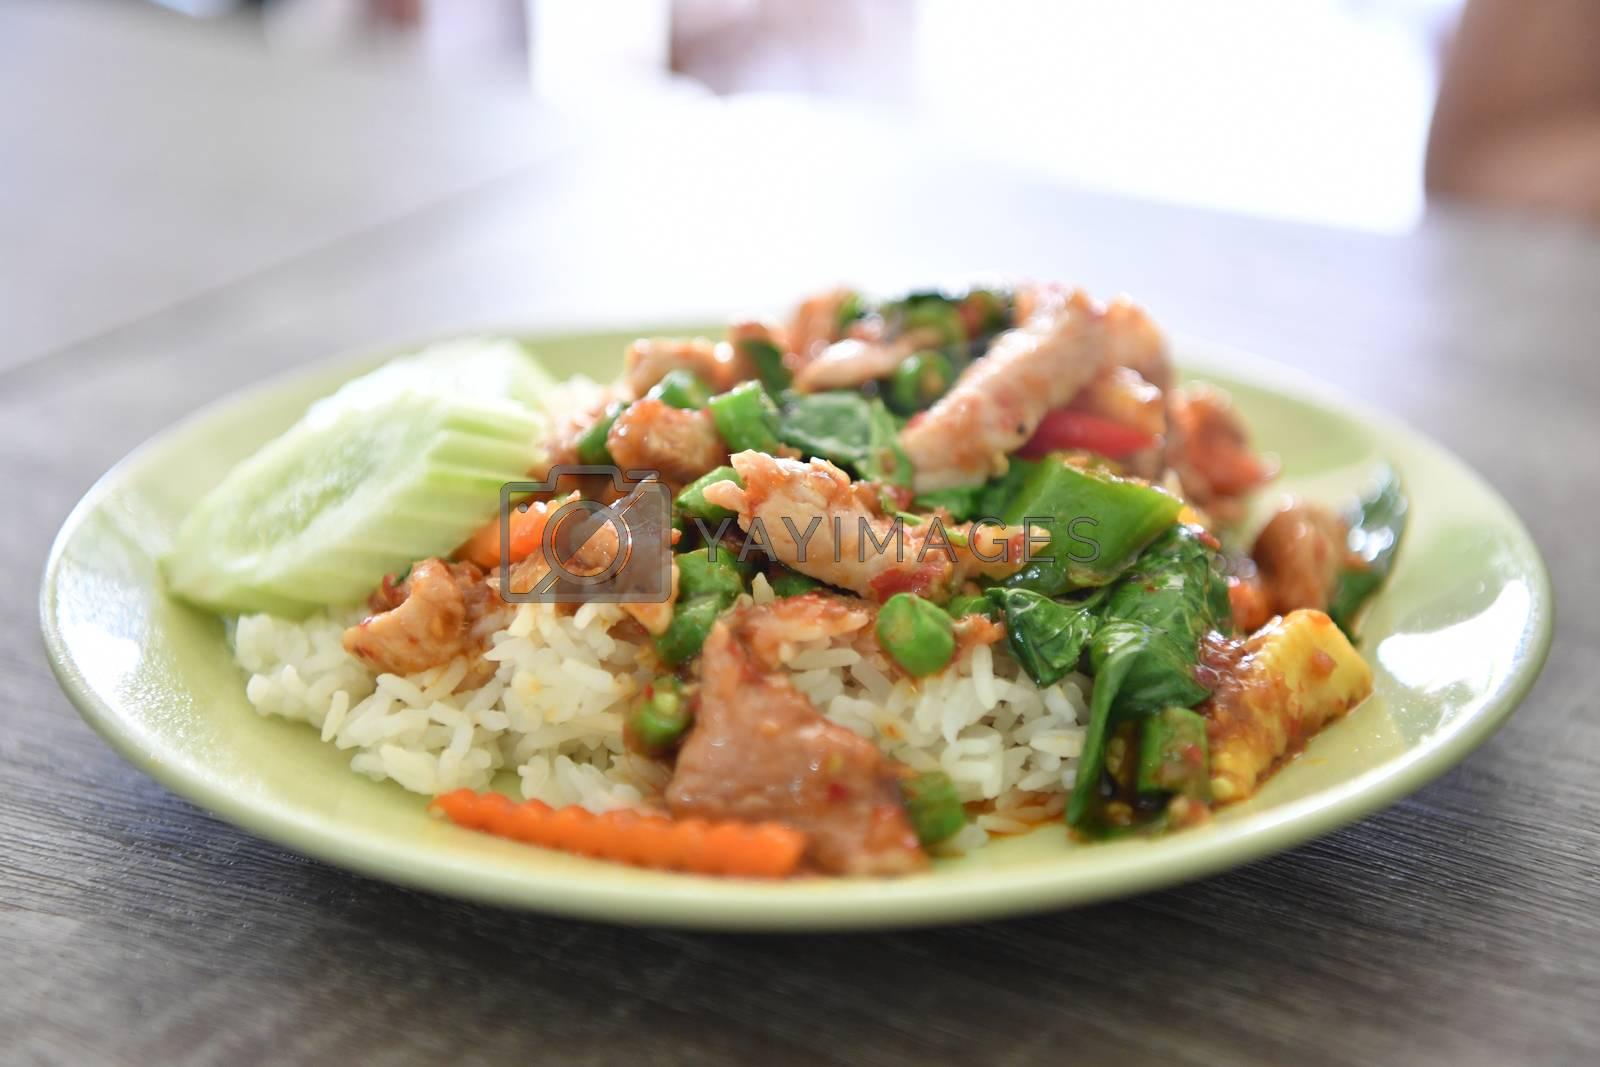 Stir fried pork and curry paste on rice, Thai food.